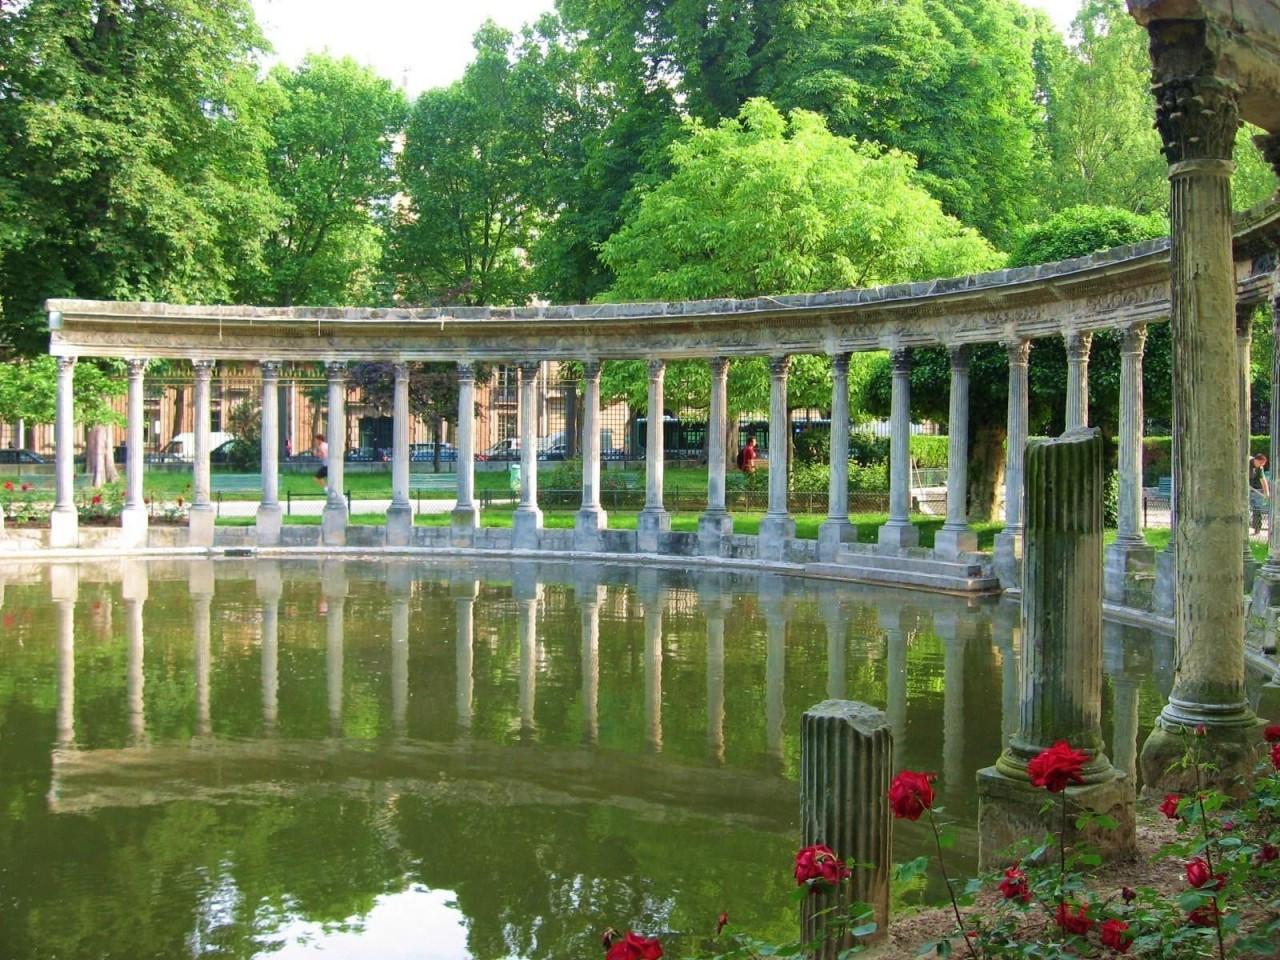 Il Parc Monceau di Parigi - Orari di apertura dei parchi a Parigi